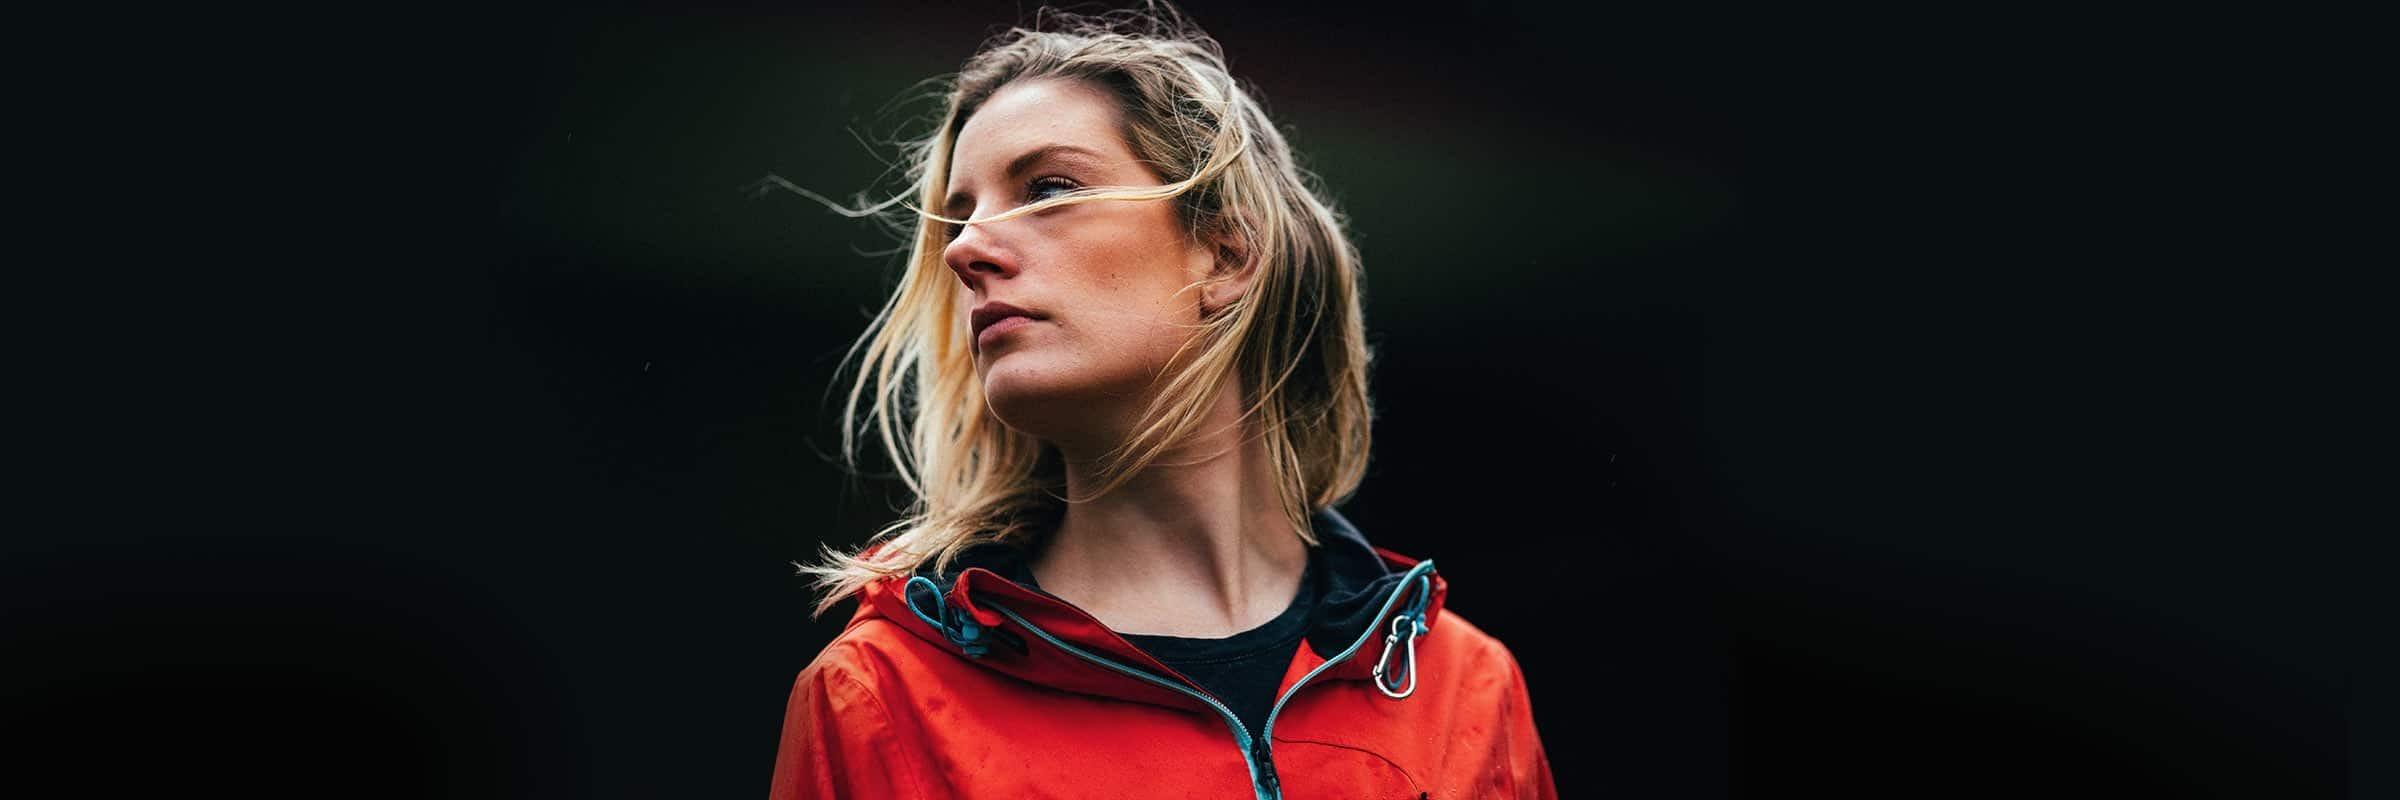 Barbour, Canada Goose, Herno, Mackage, Mountain Hardwear, Soia & Kyo. Top 6 Stylish Fall Urban Jackets for Women